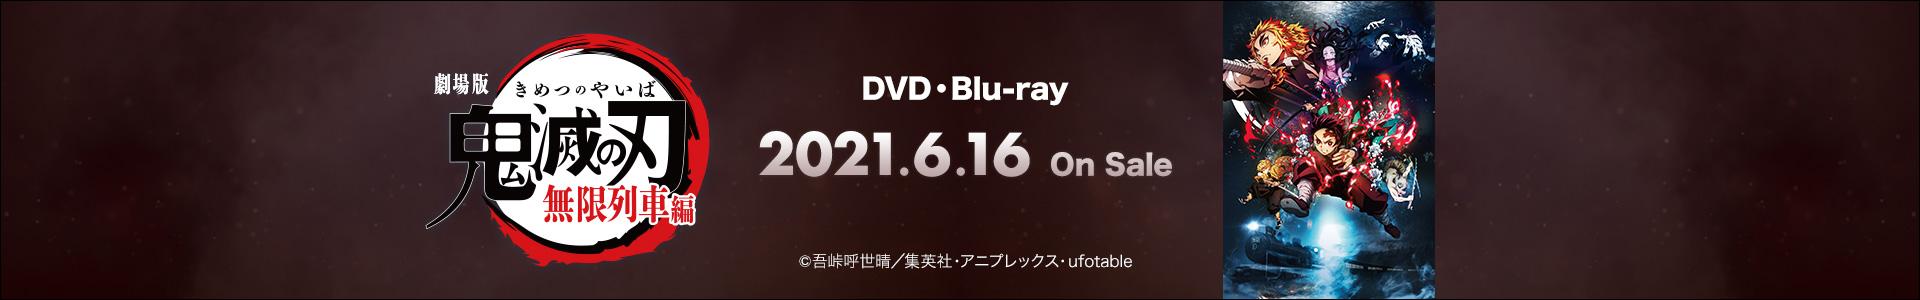 劇場版「鬼滅の刃」 無限列車編 DVD・Blu-ray 2021.6.16 On Sale